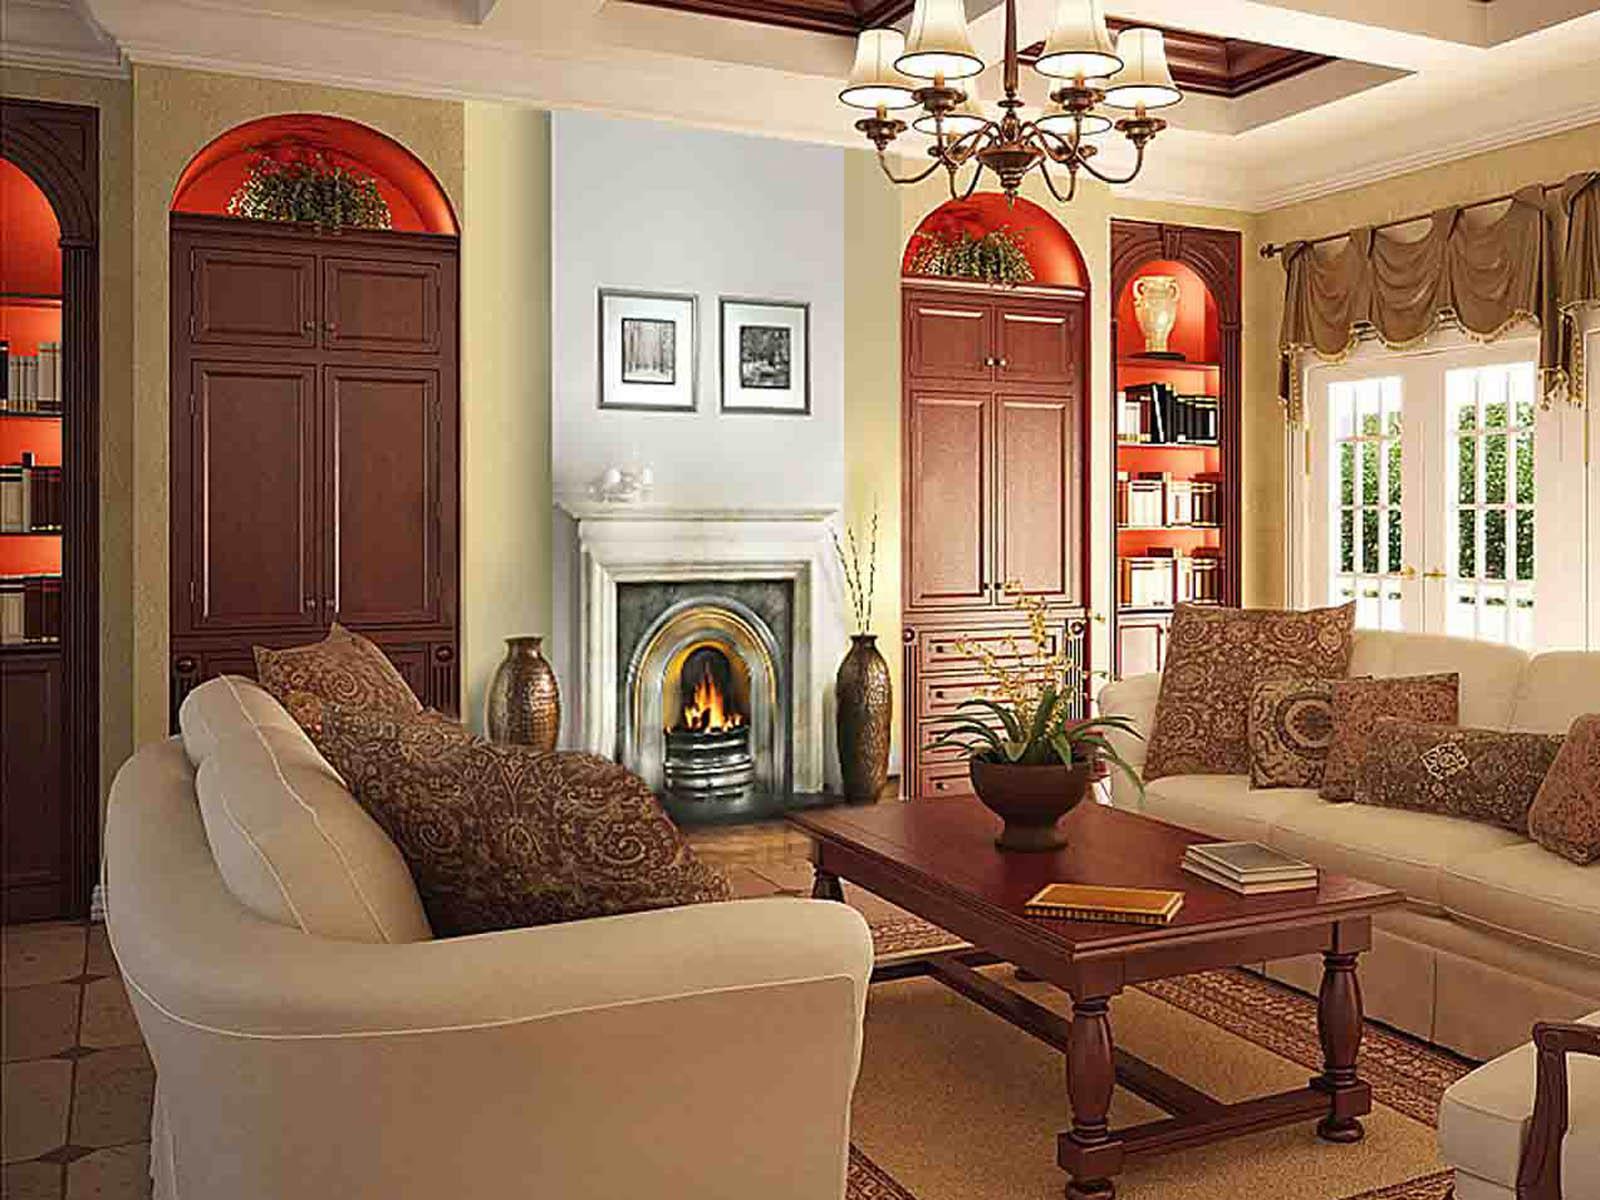 http://4.bp.blogspot.com/-VSDLkBsSXOo/UKpBD7F4H7I/AAAAAAAANuo/DiWvXYm0_PQ/s1600/Modern+Living+Room+Paos+03.jpg